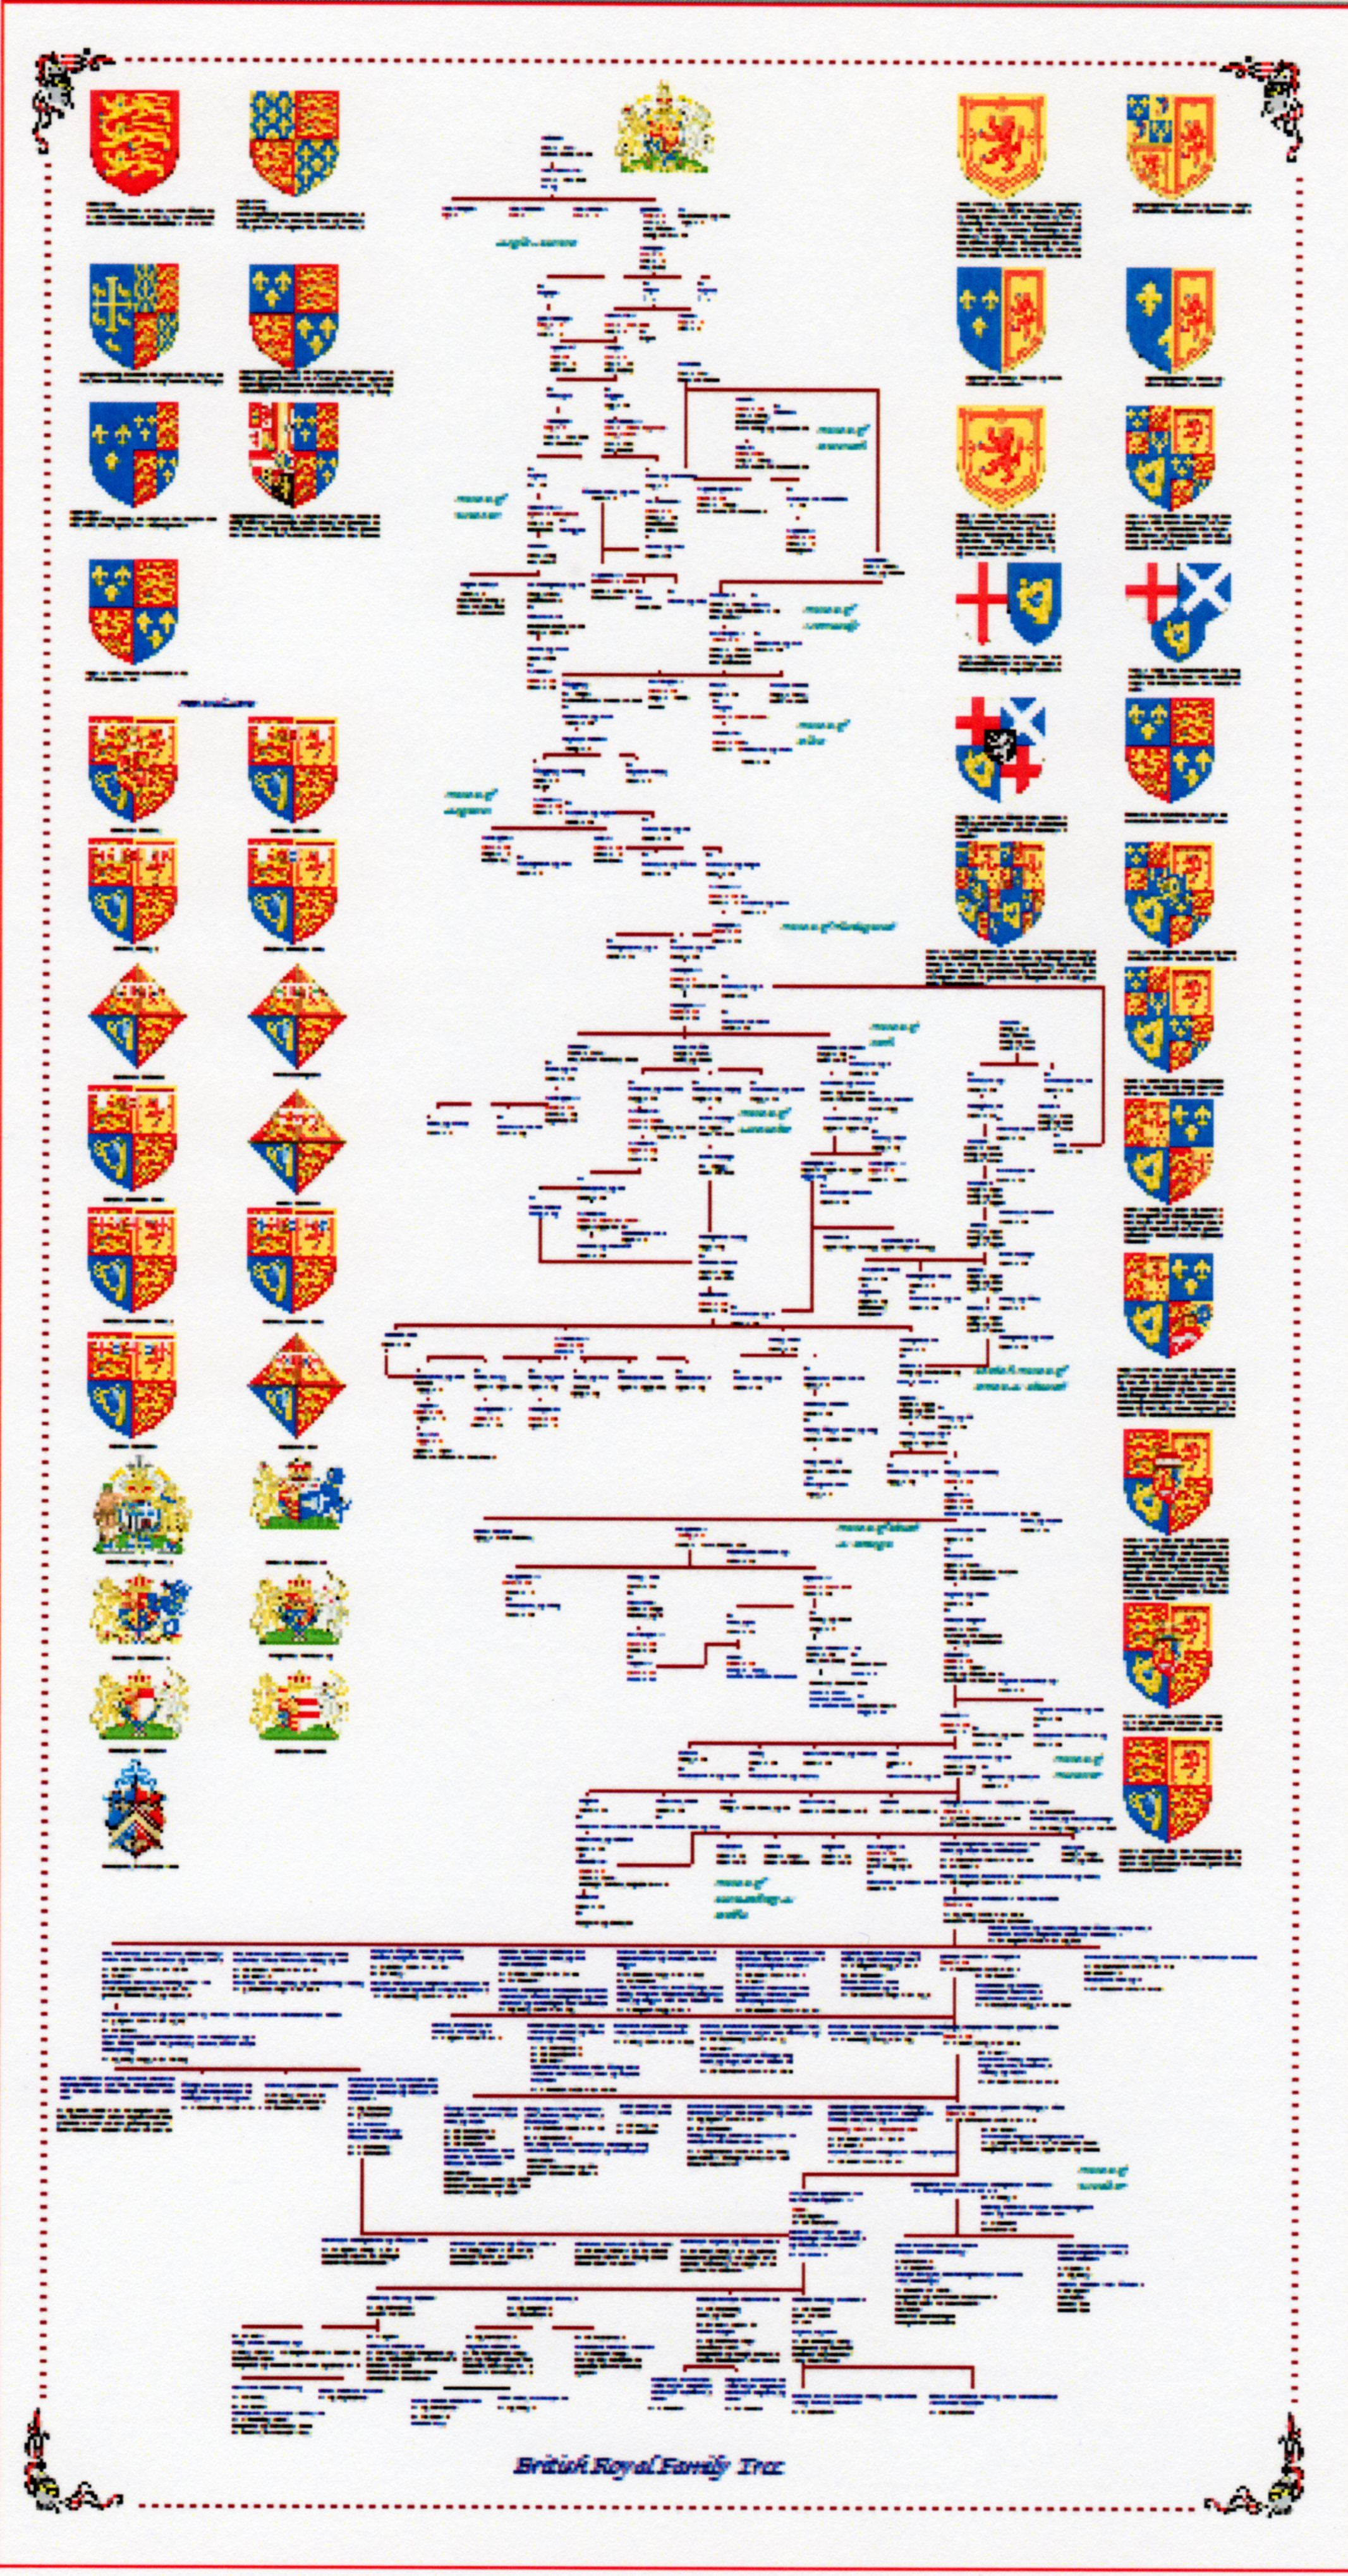 small resolution of british royal family tree